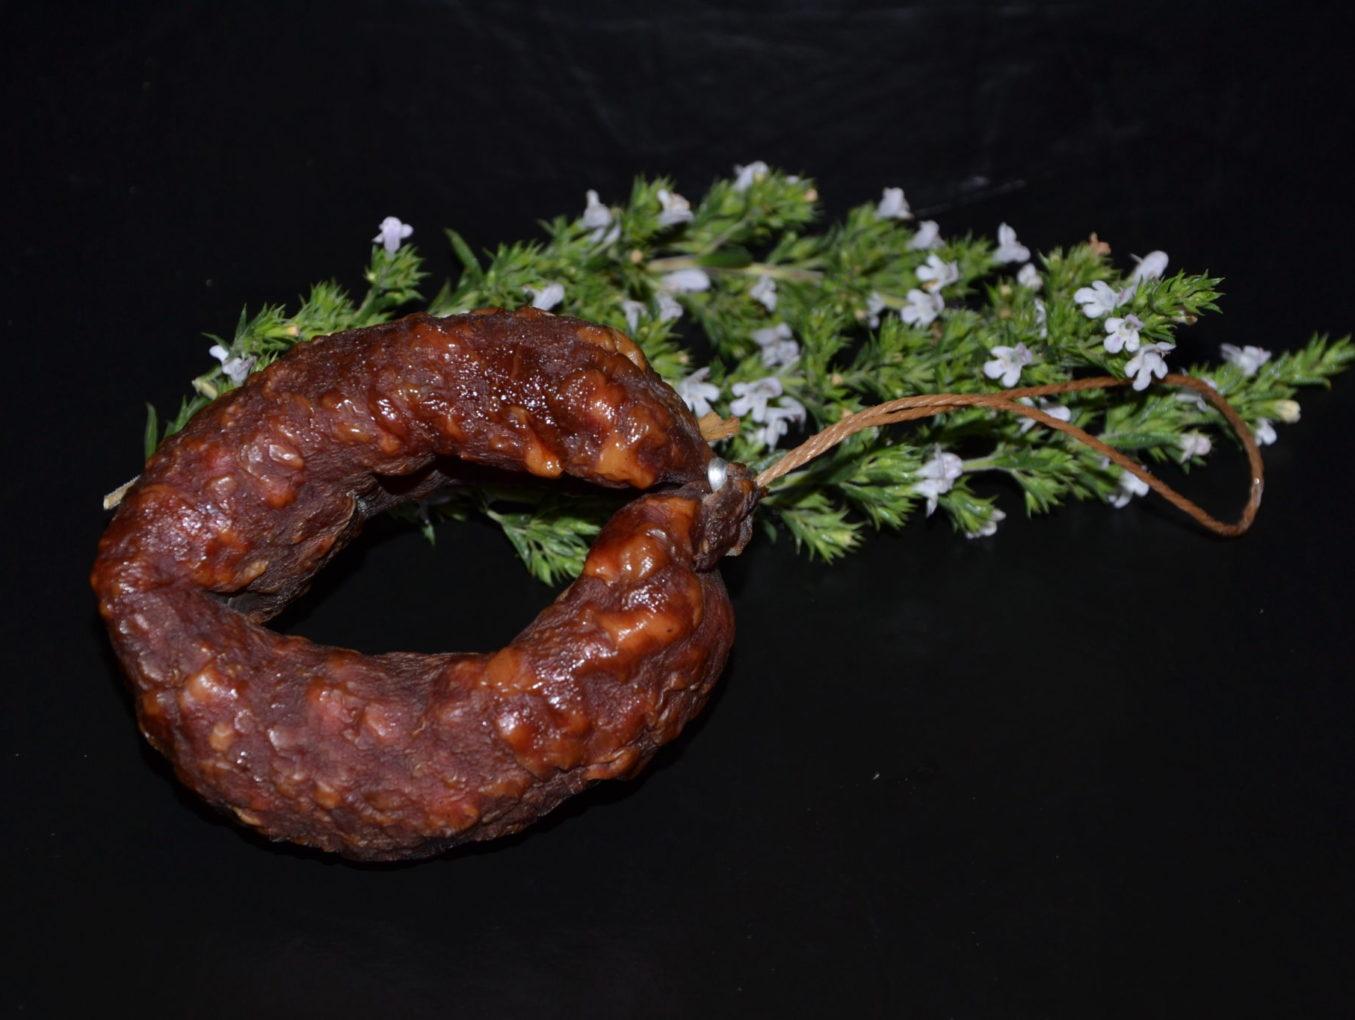 Kronenwurst